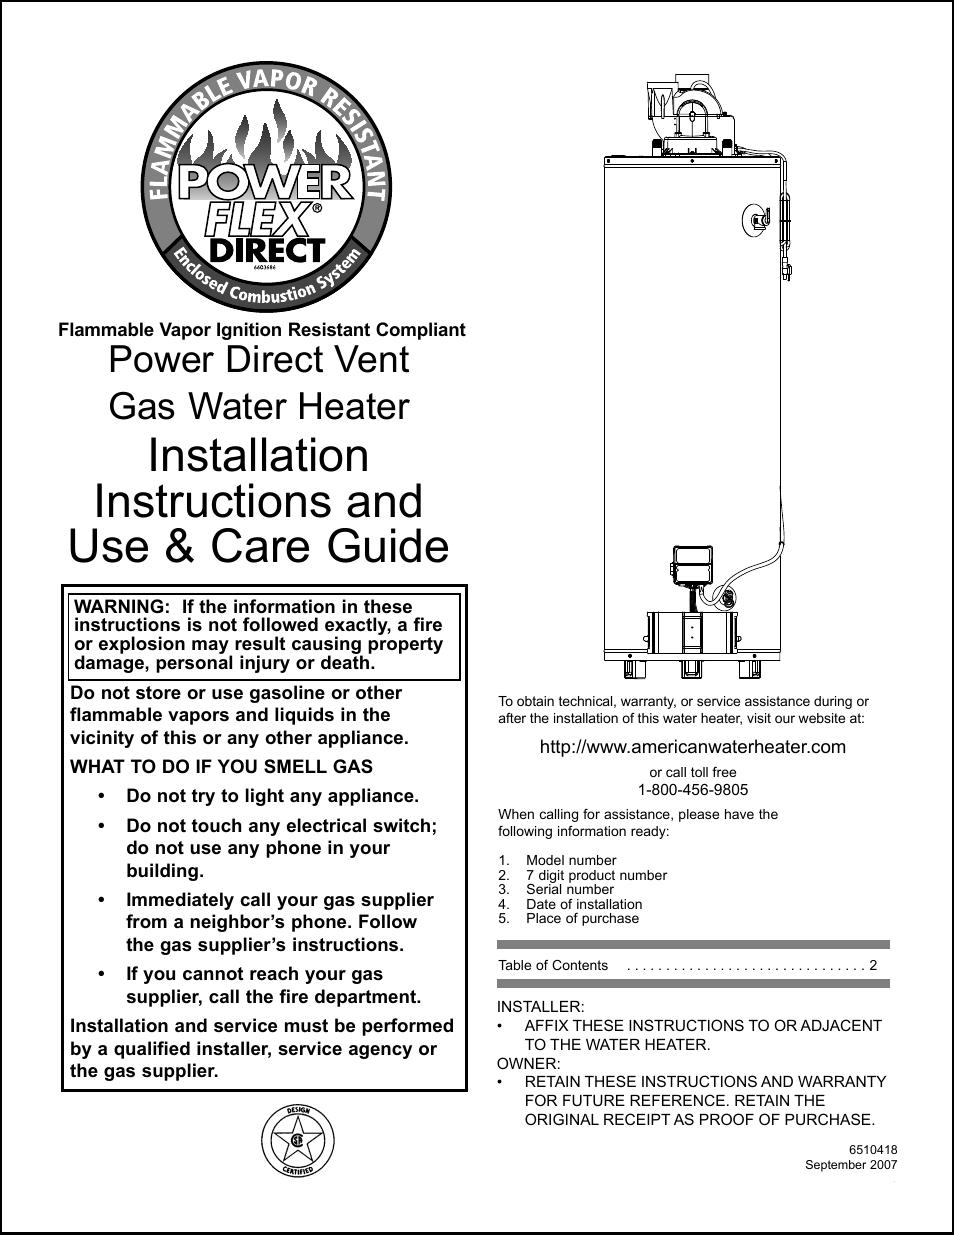 American Water Heater Power Flex 40-42K BTU User Manual